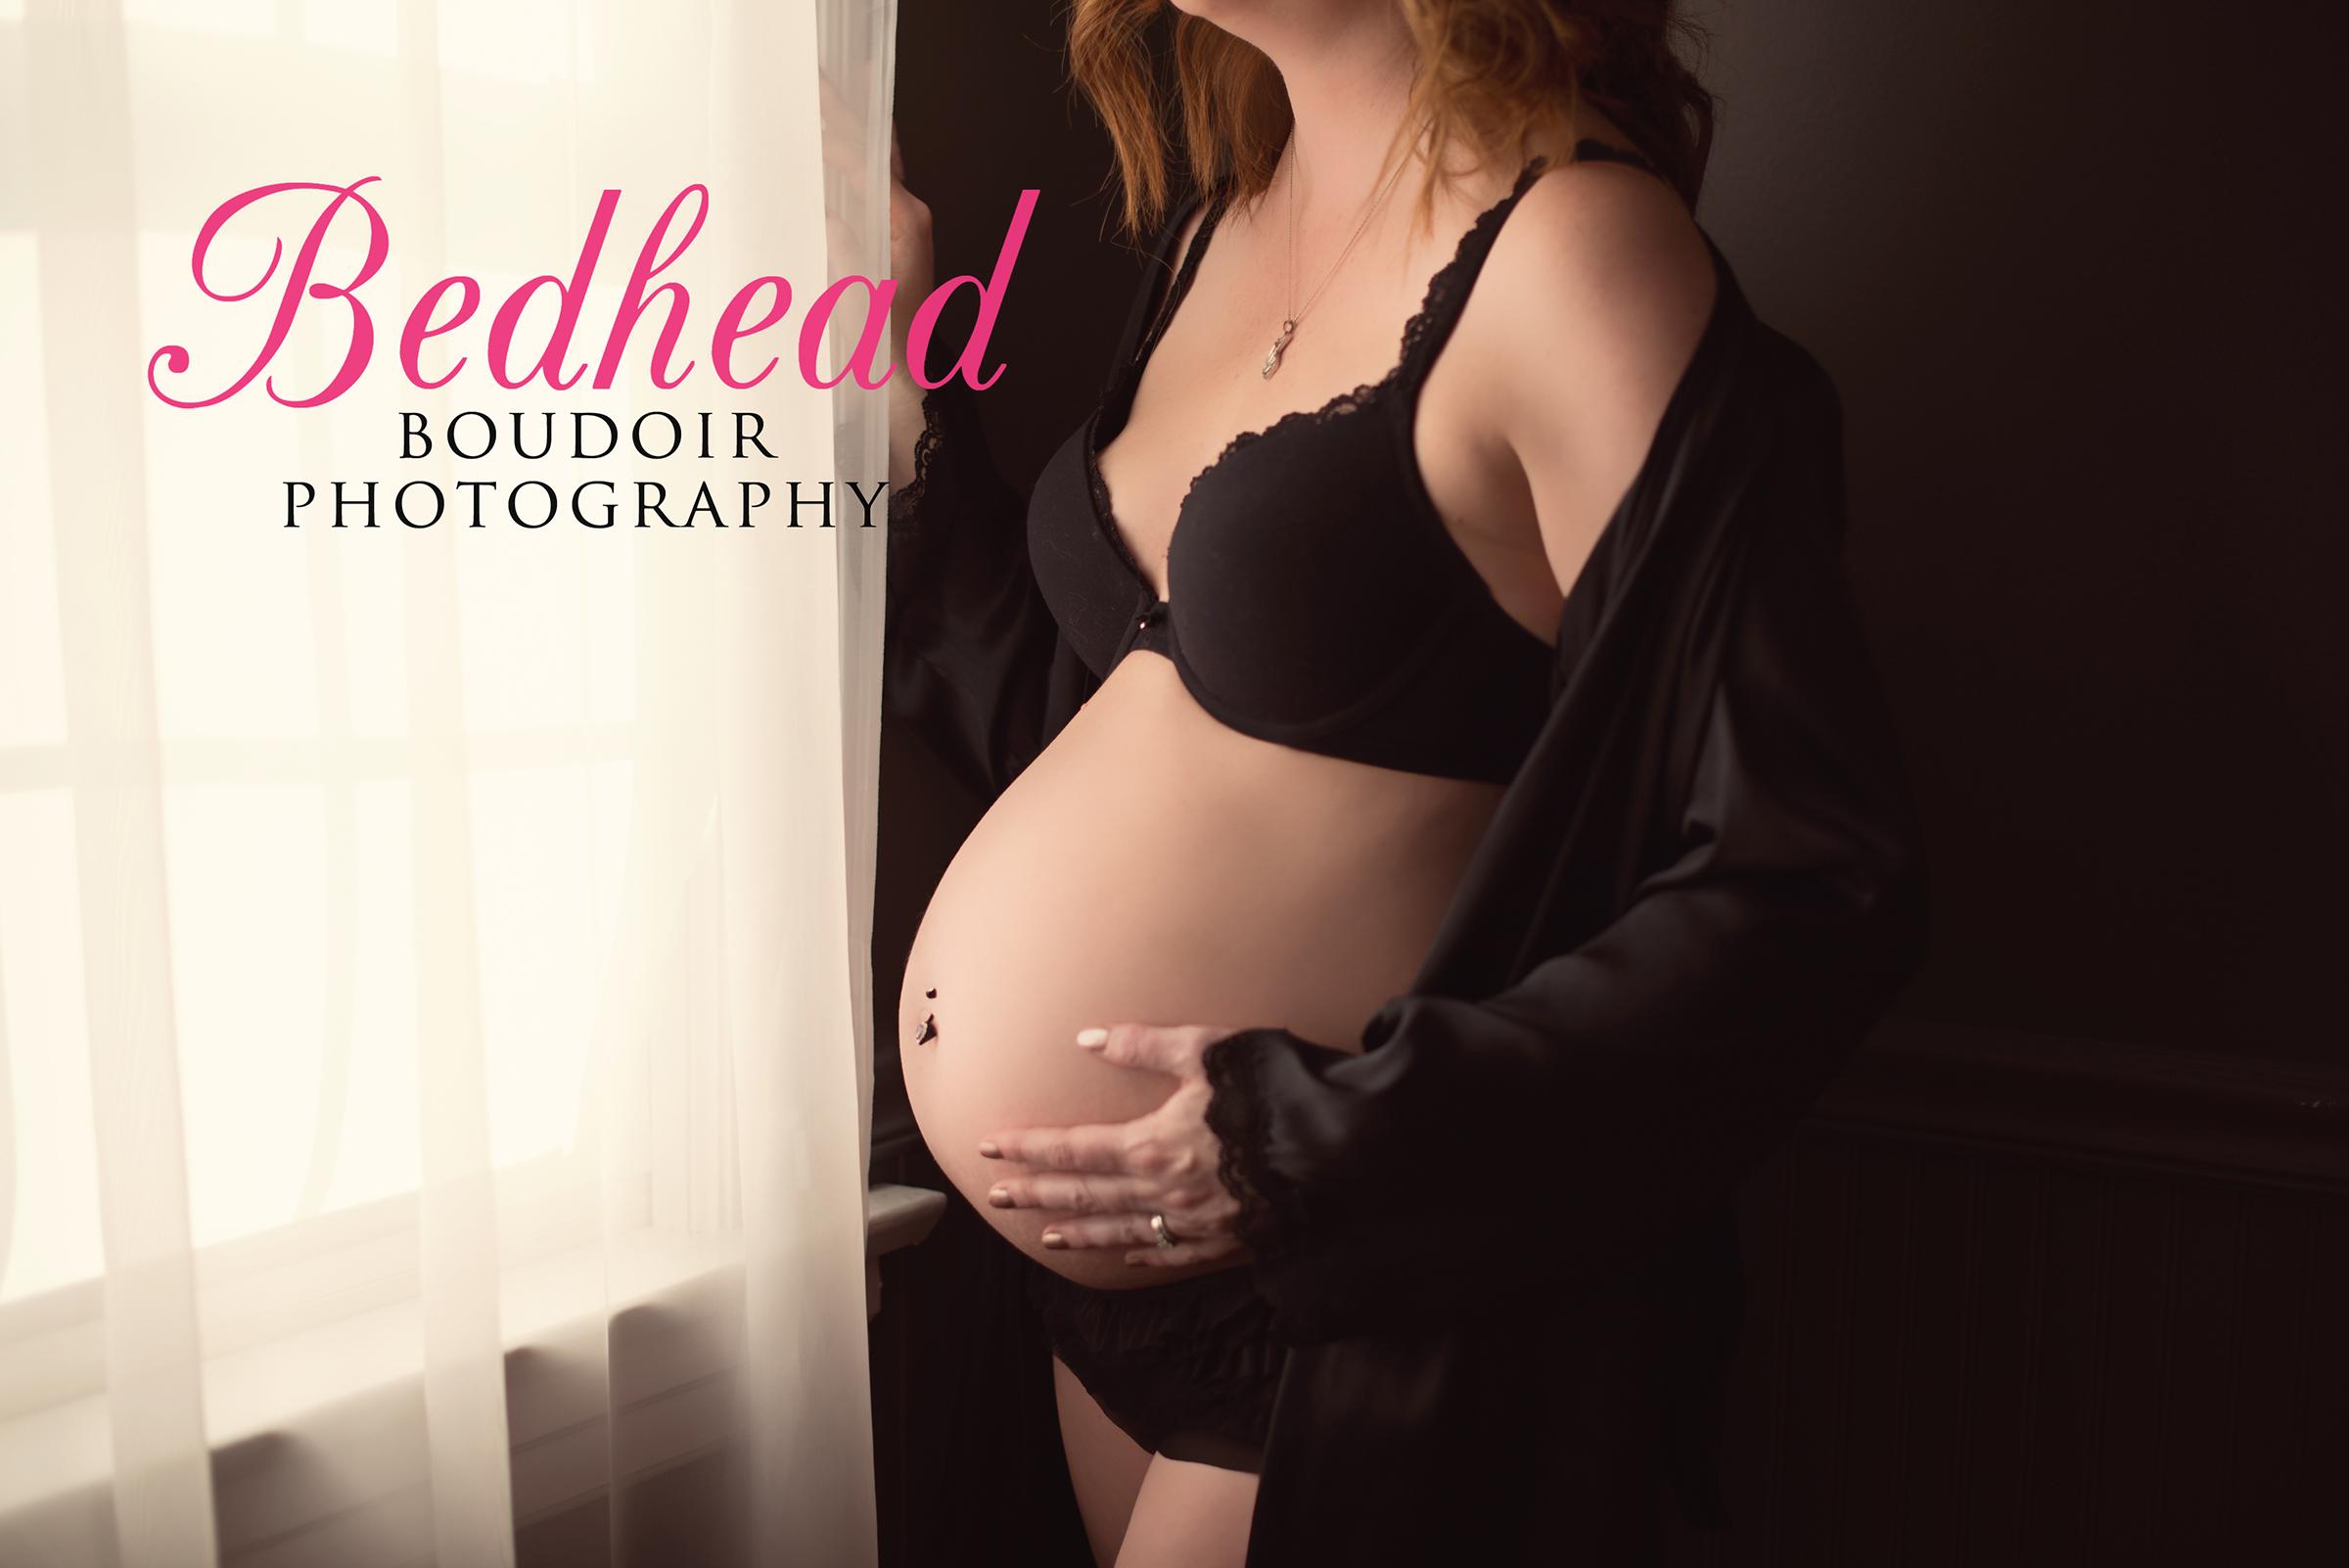 Boudoir_Photography_Chicago_Bedhead_14.jpg